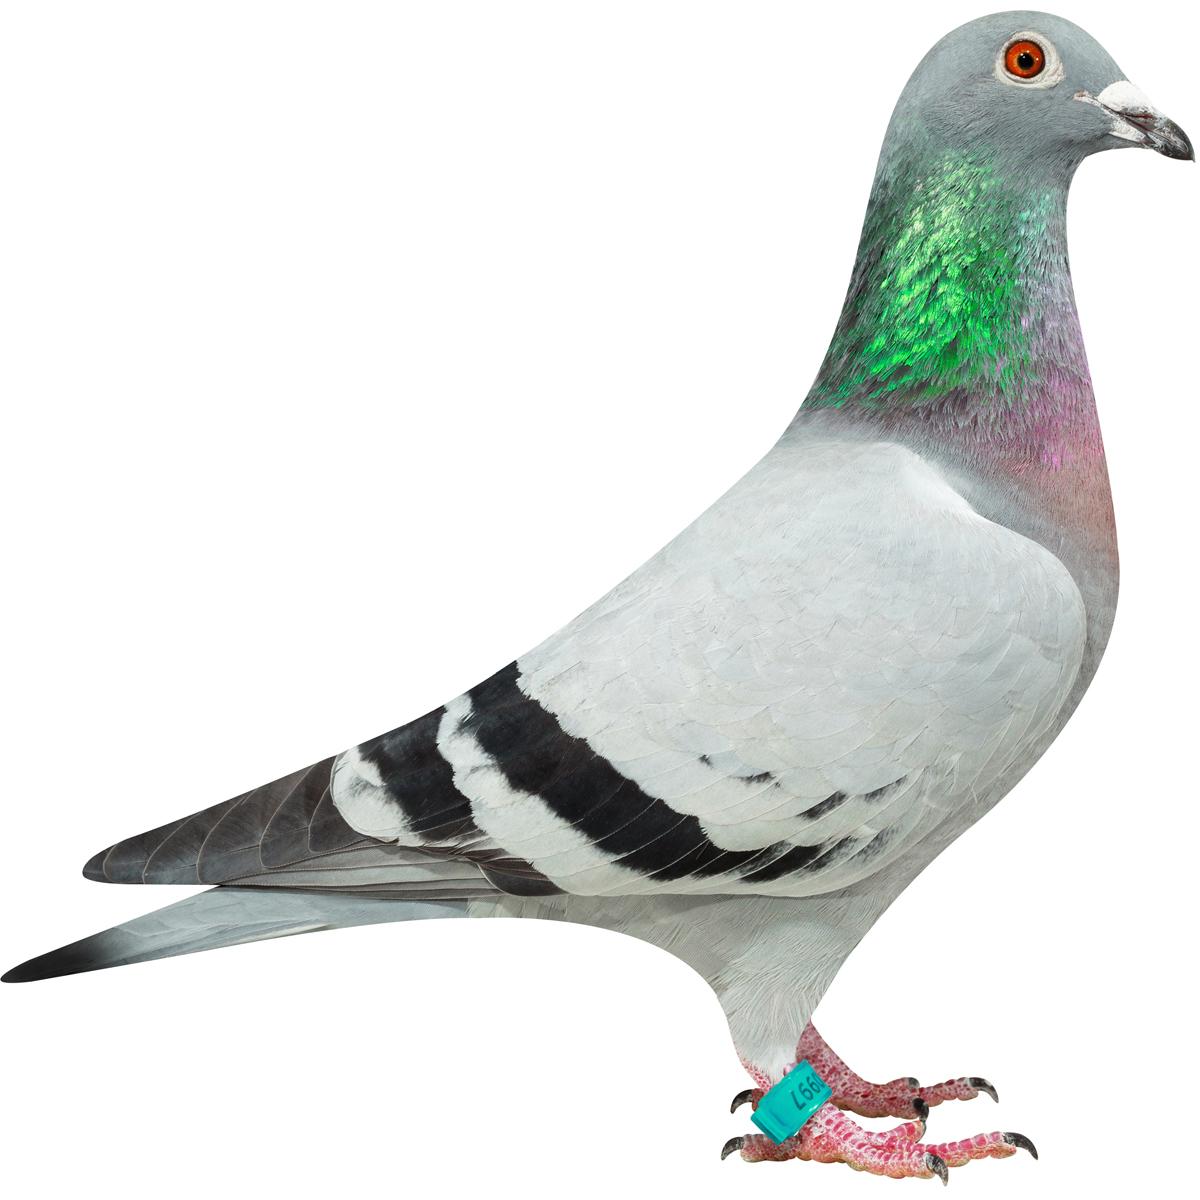 NL16-1310997